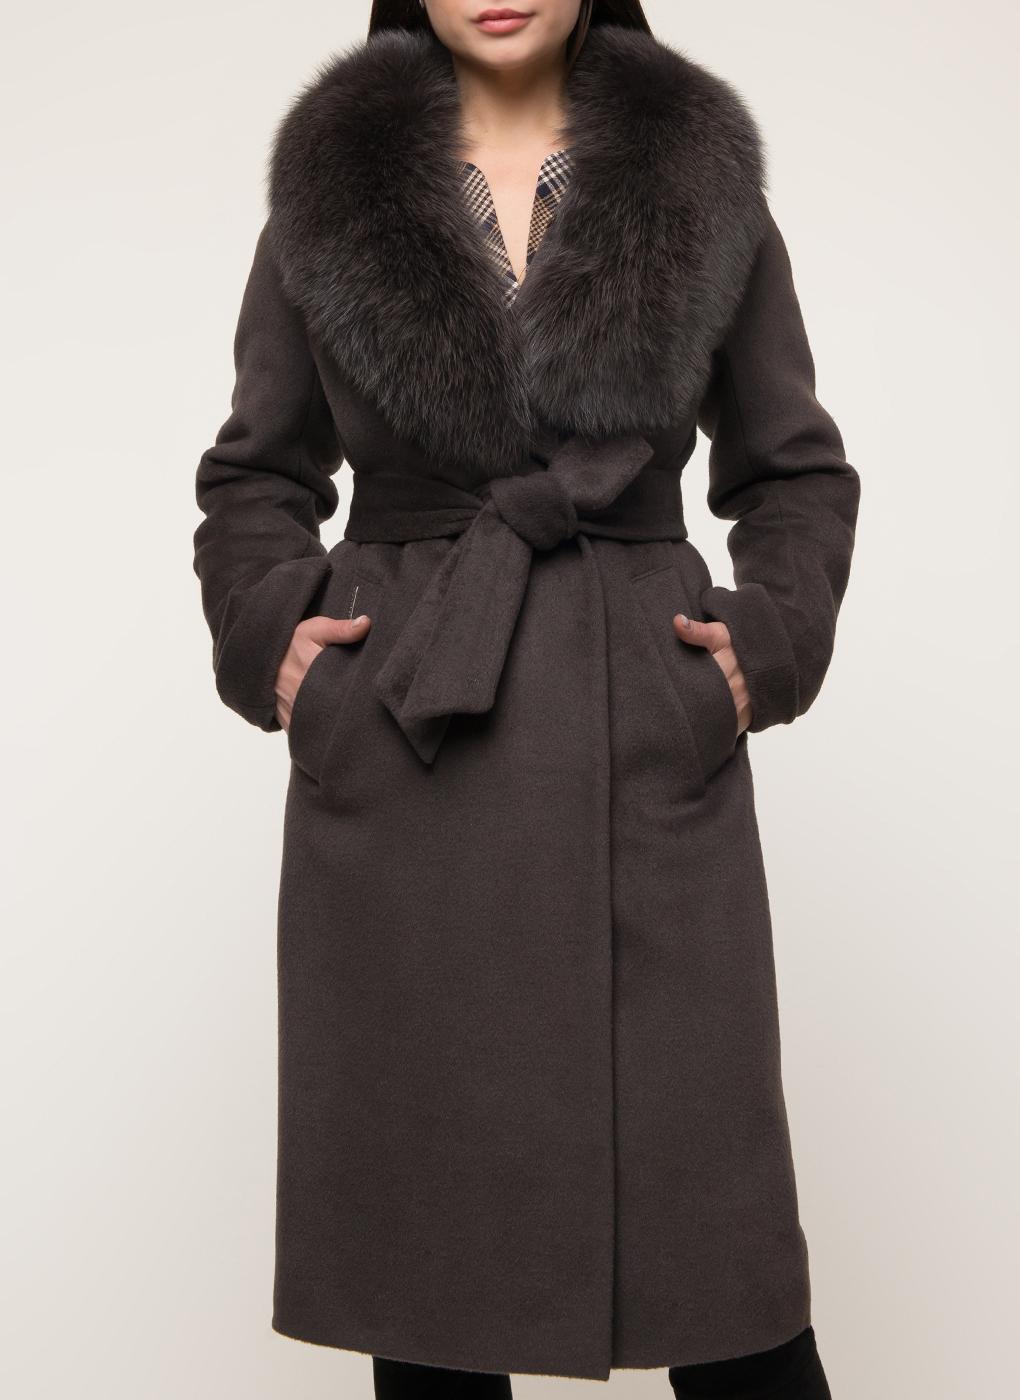 Пальто прямое шерстяное 46, idekka фото